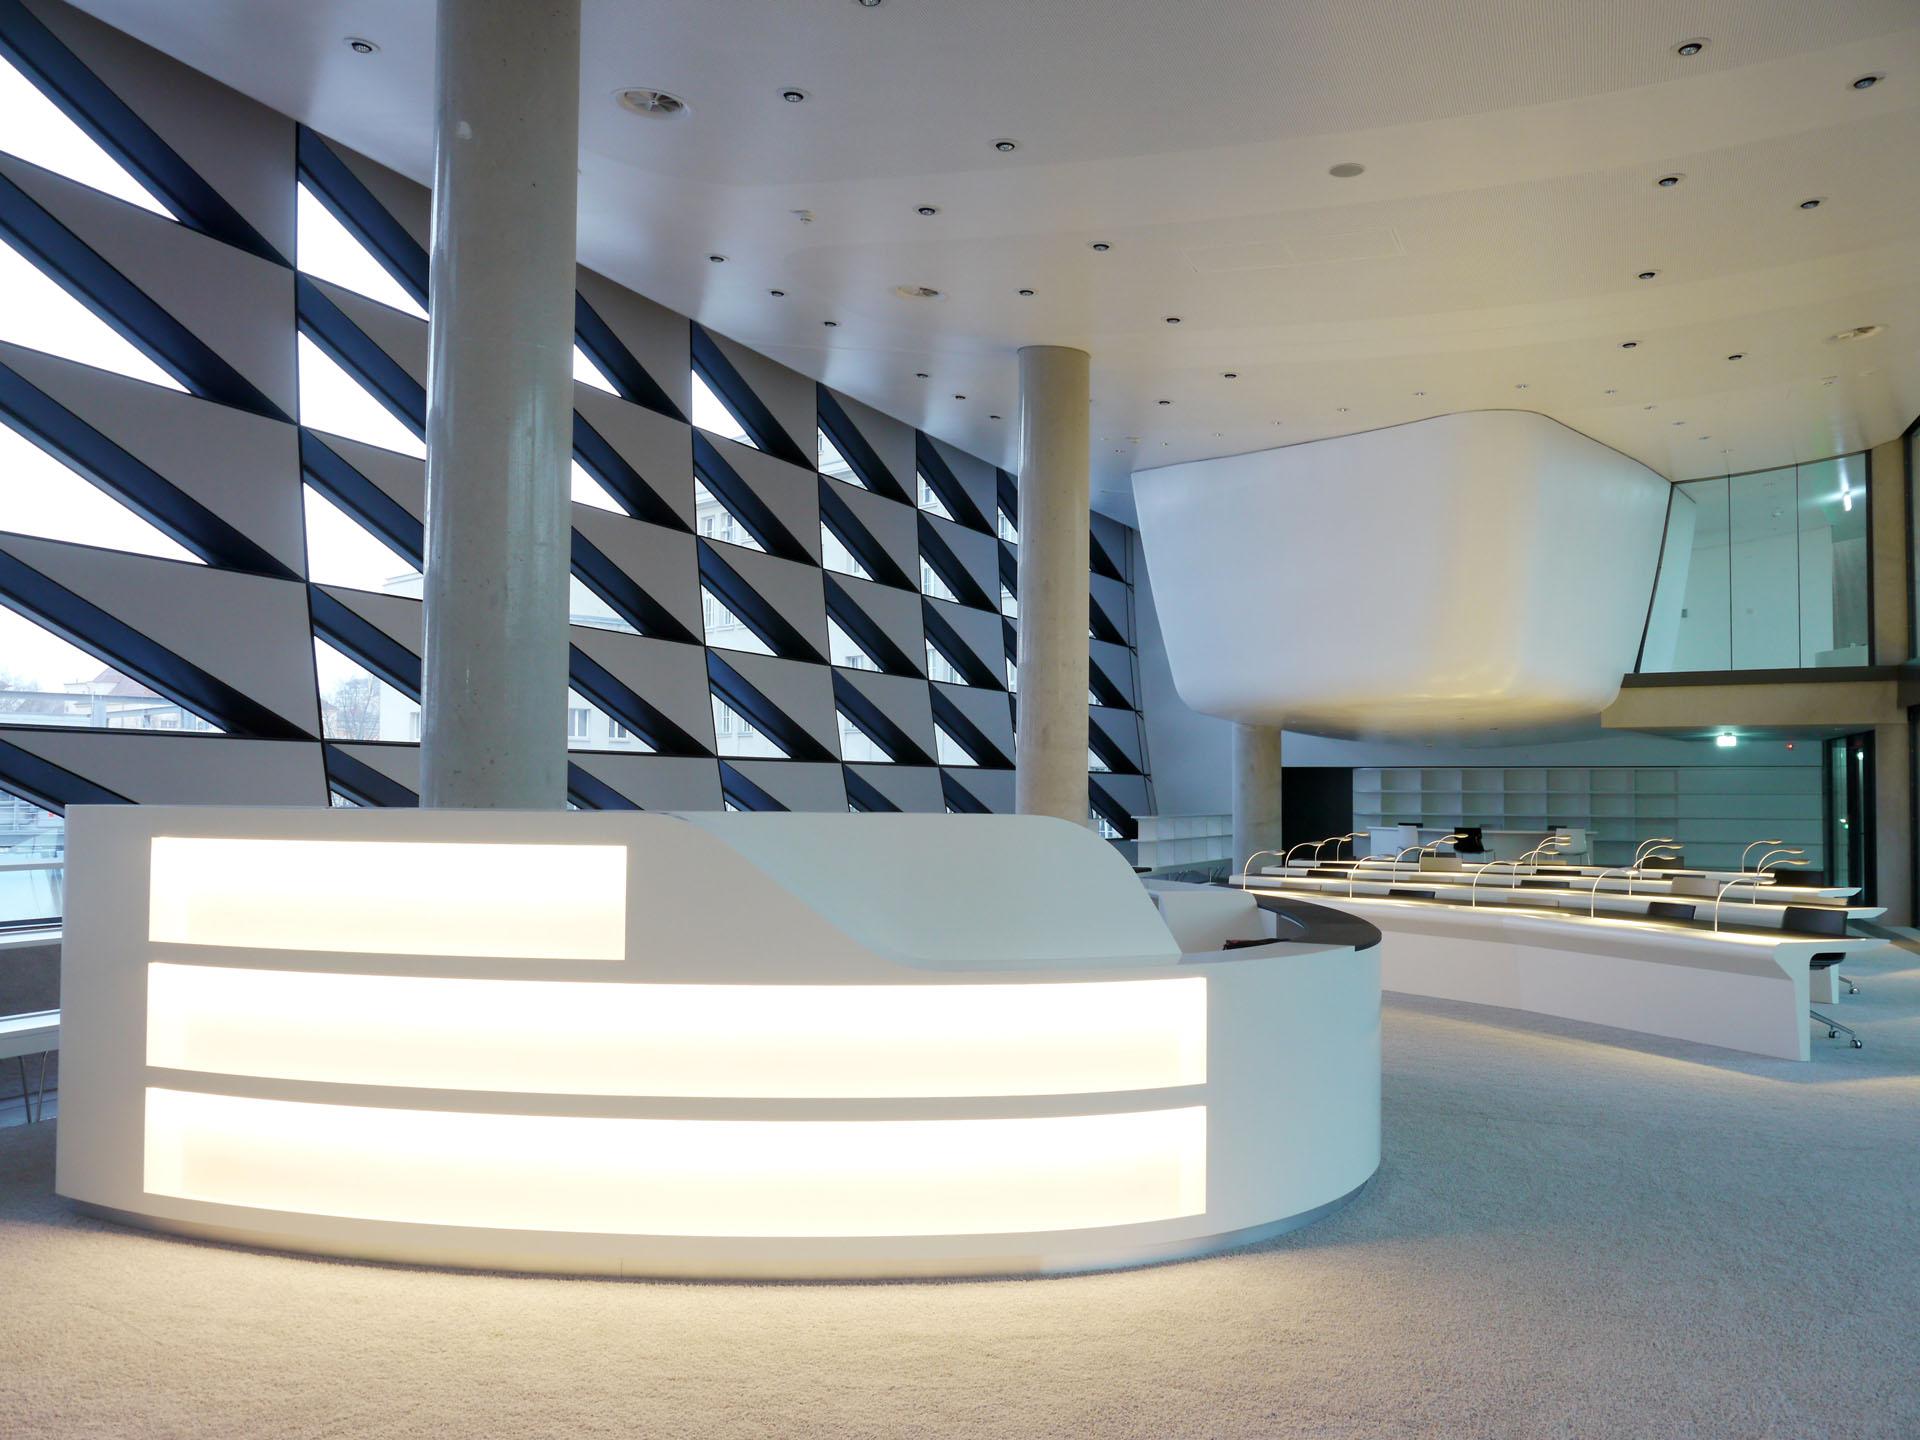 DNB Standort Leipzig library building architecture design interior view